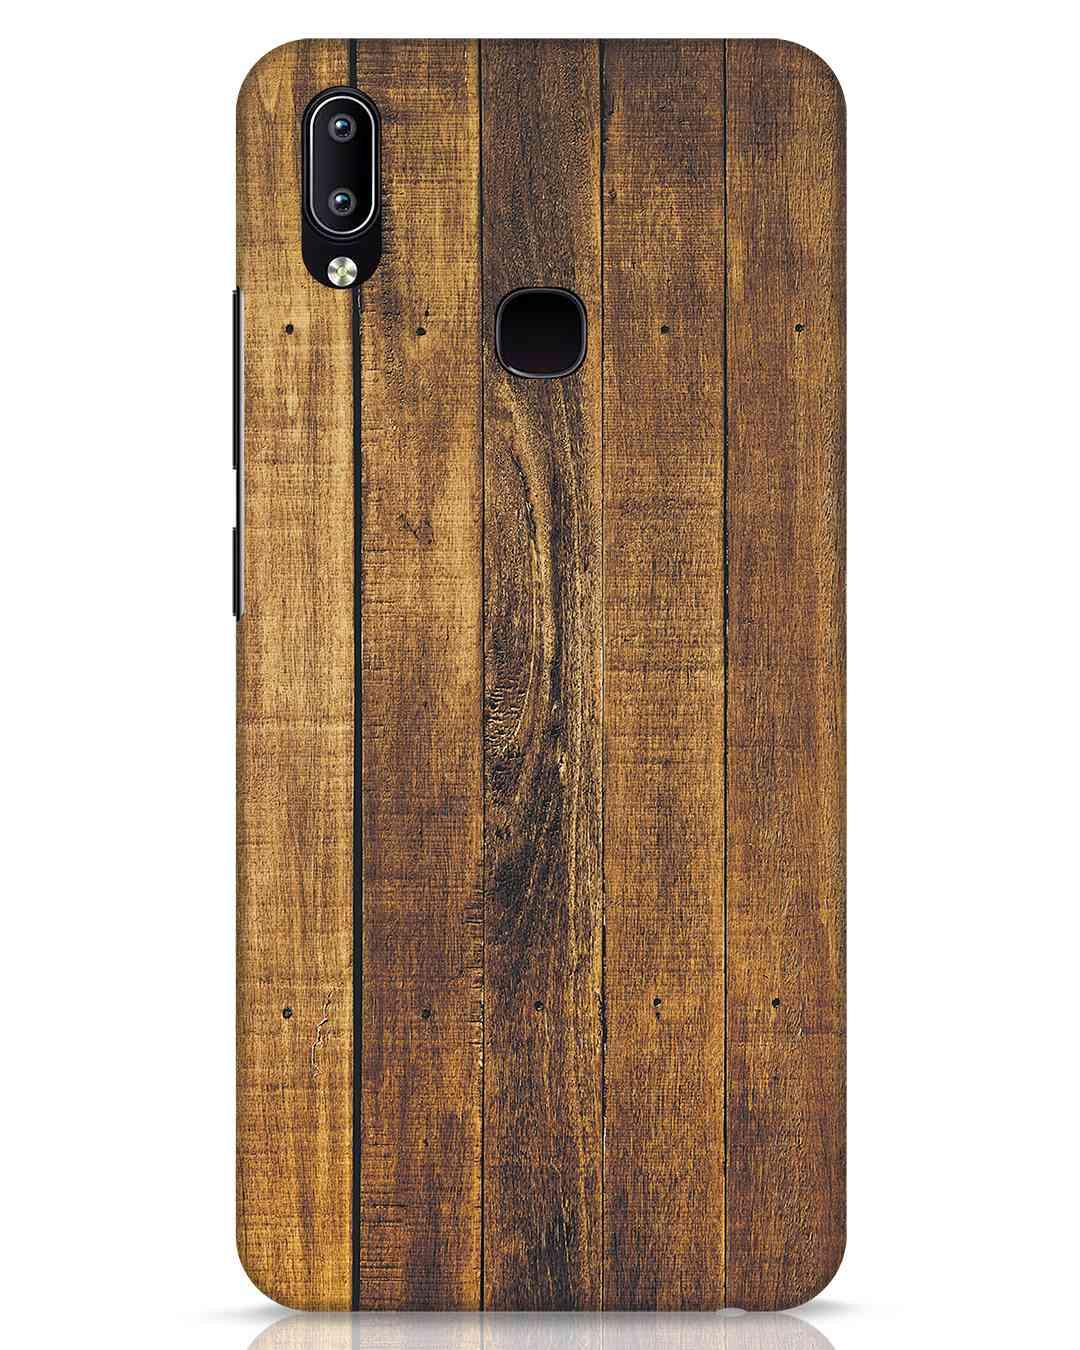 Buy Teak Vivo Y91 Mobile Case Online At 175 0 Bewakoof Com